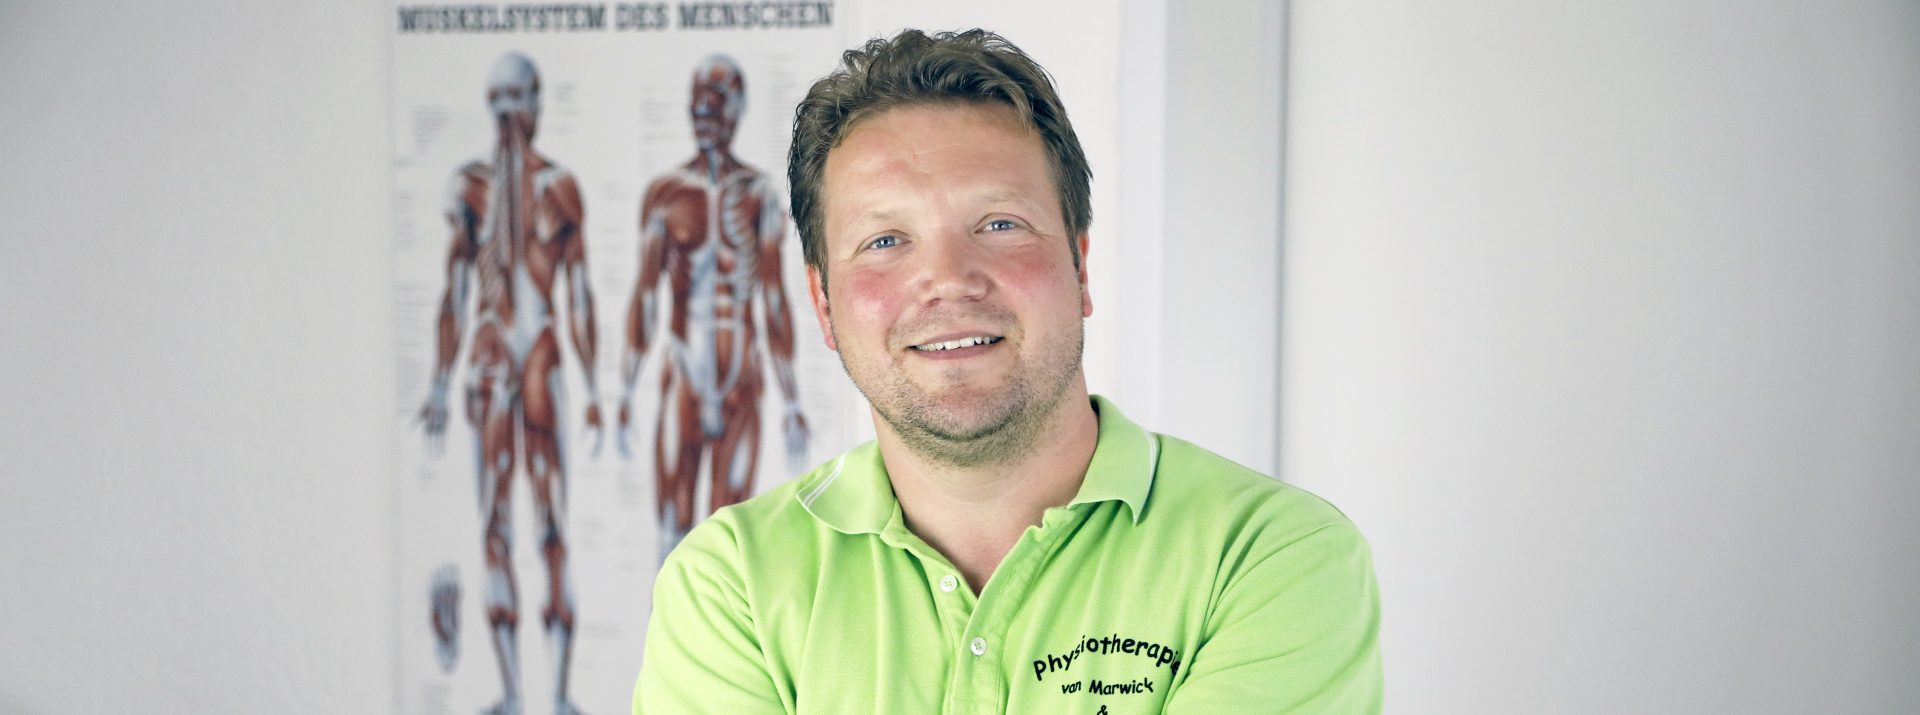 Physiotherapeut Michael van Marwick